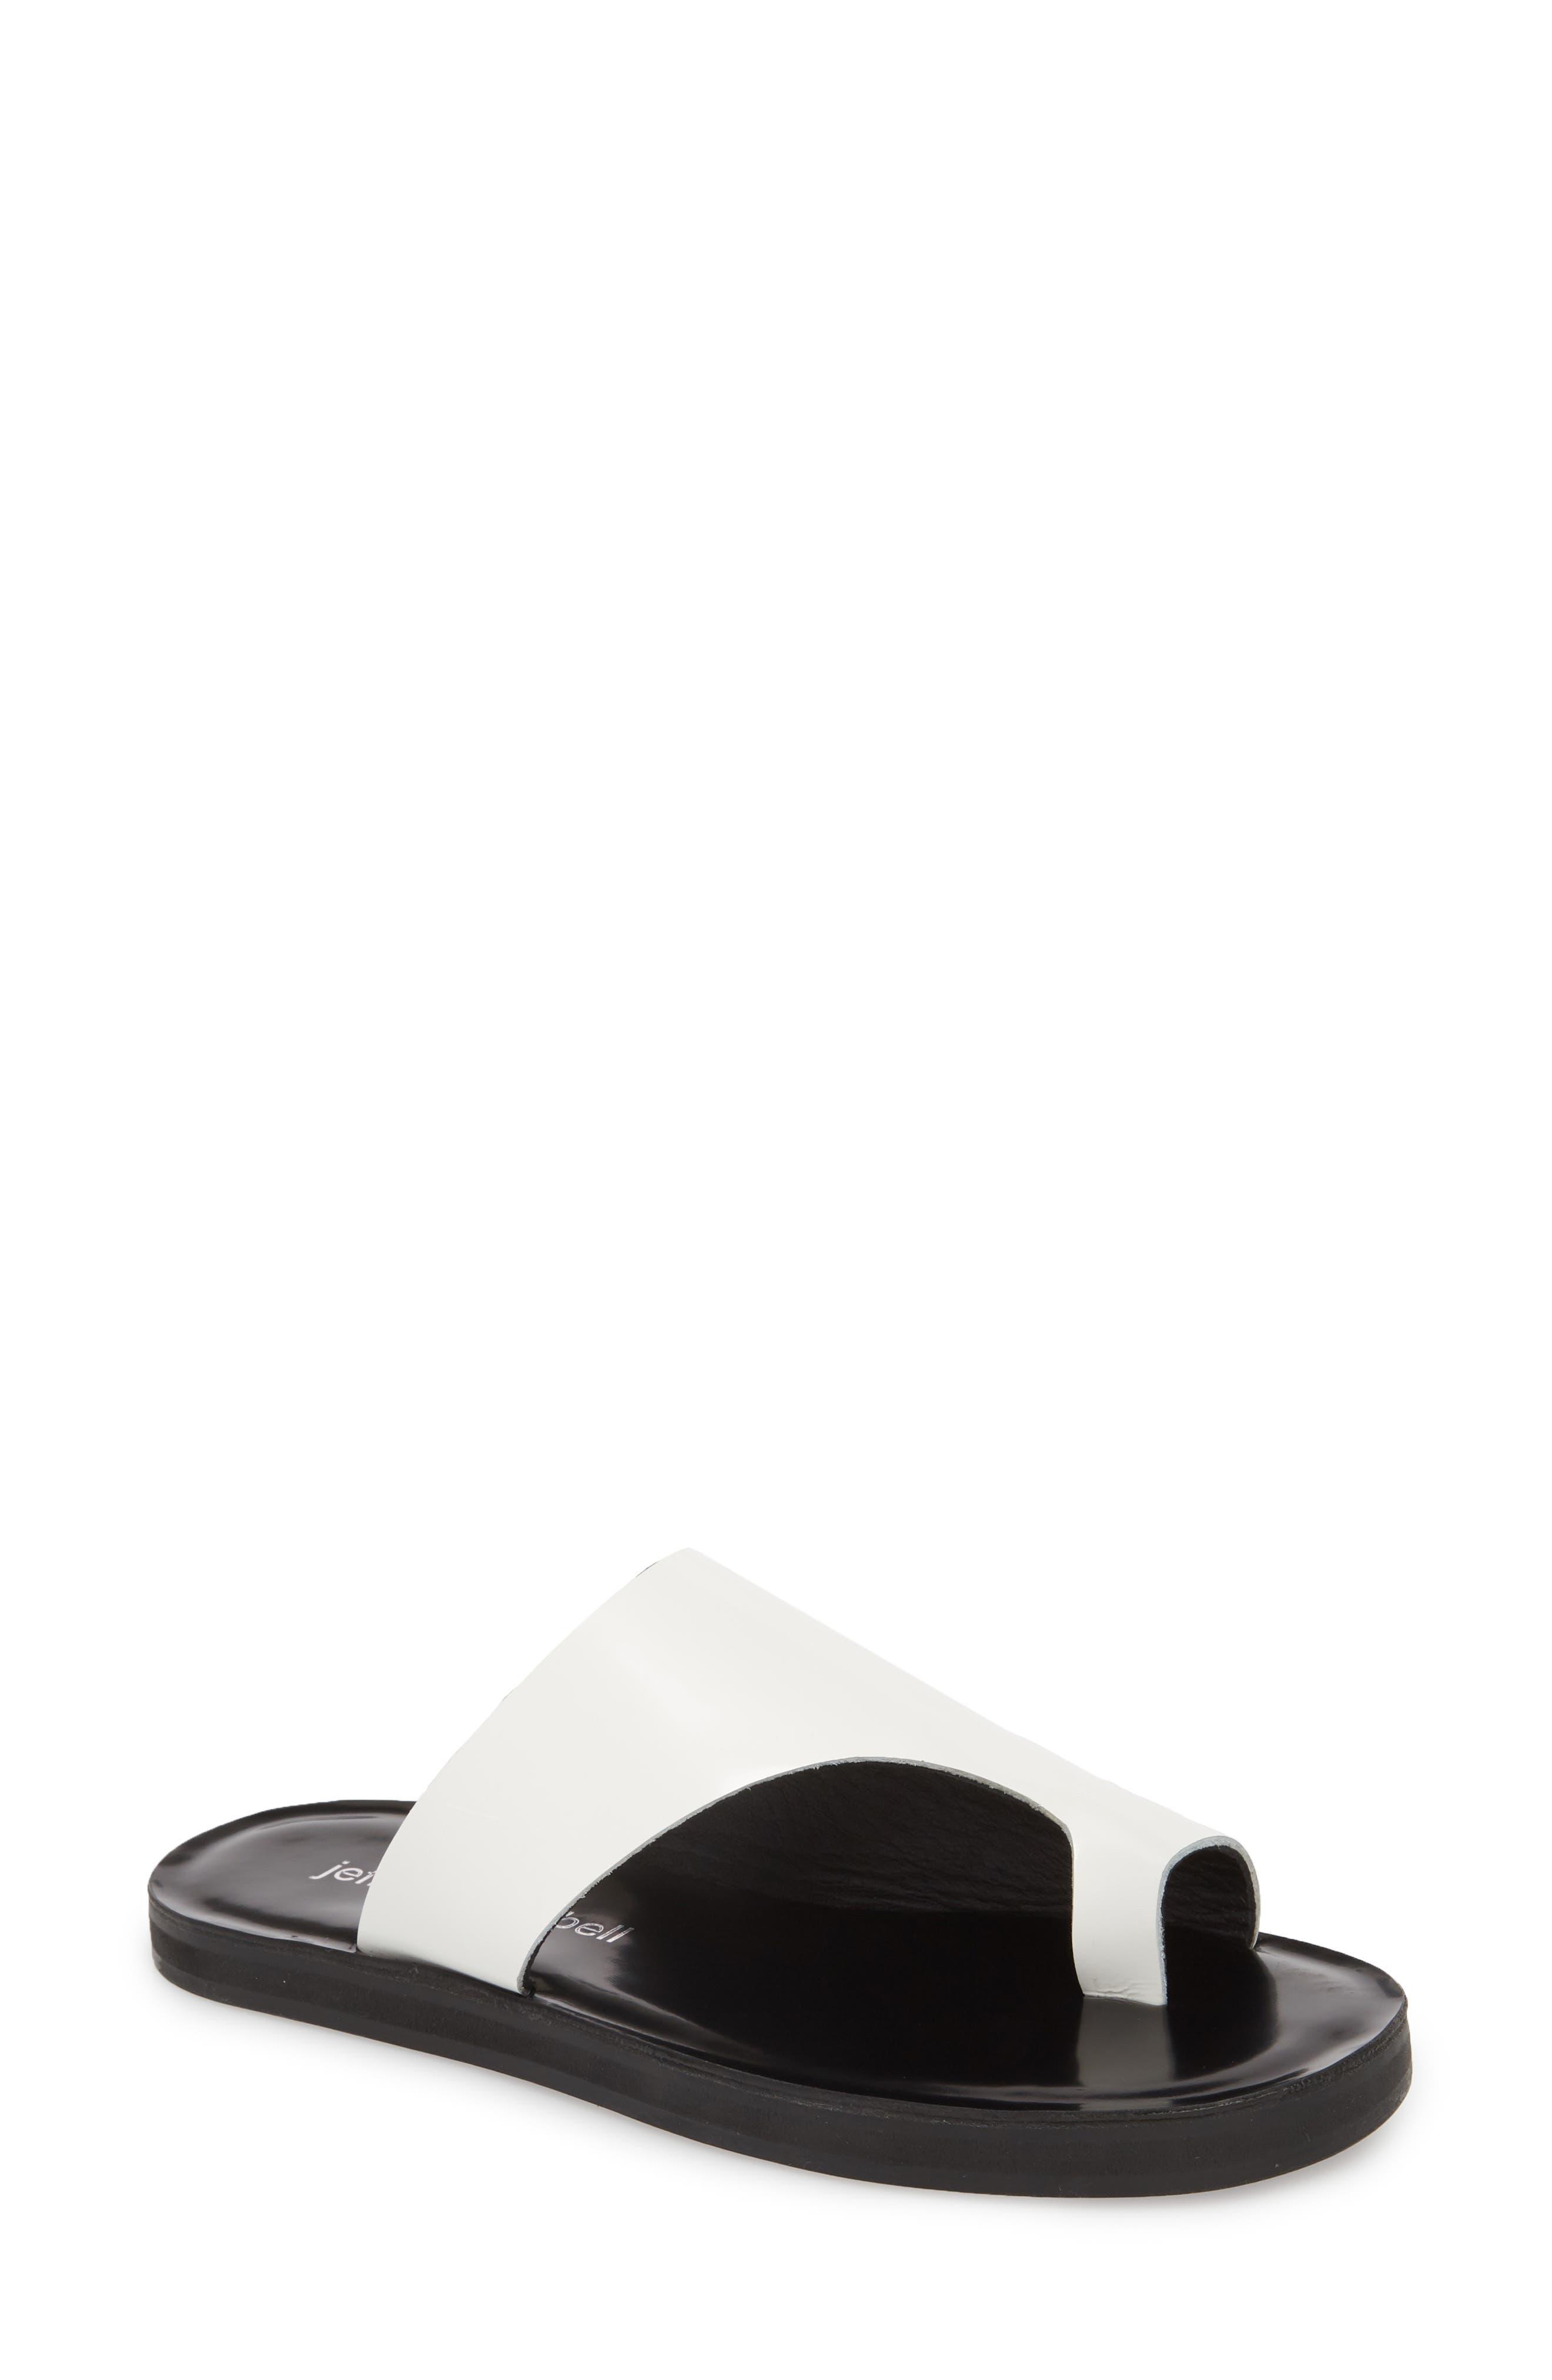 Alternate Image 1 Selected - Jeffrey Campbell Morada Asymmetrical Slide Sandal (Women)